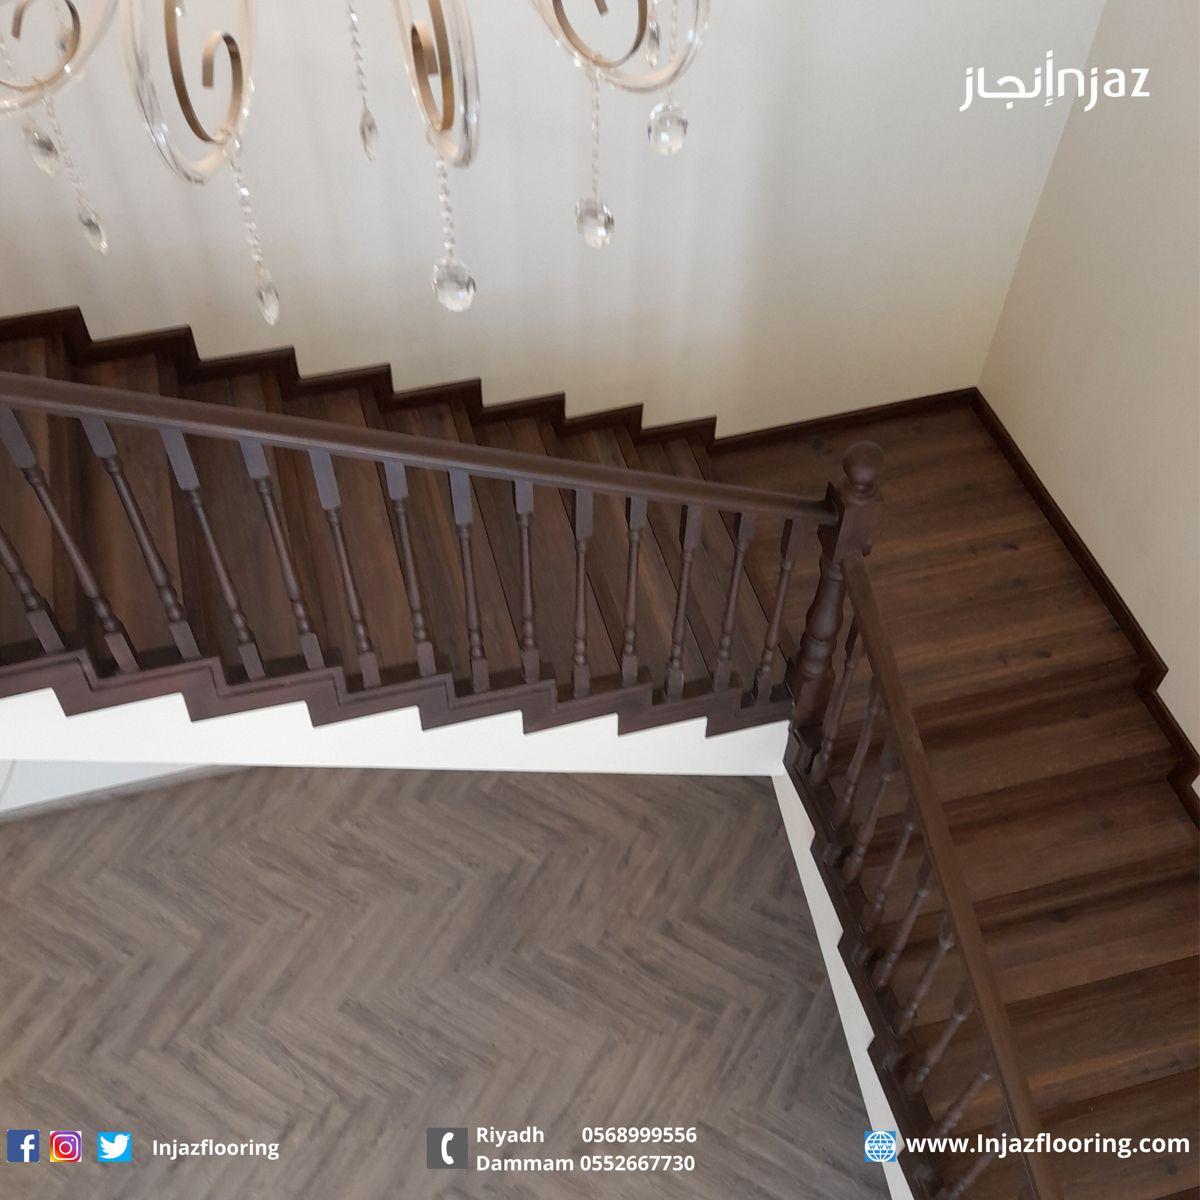 من أعمالنا Home Decor Home Decor